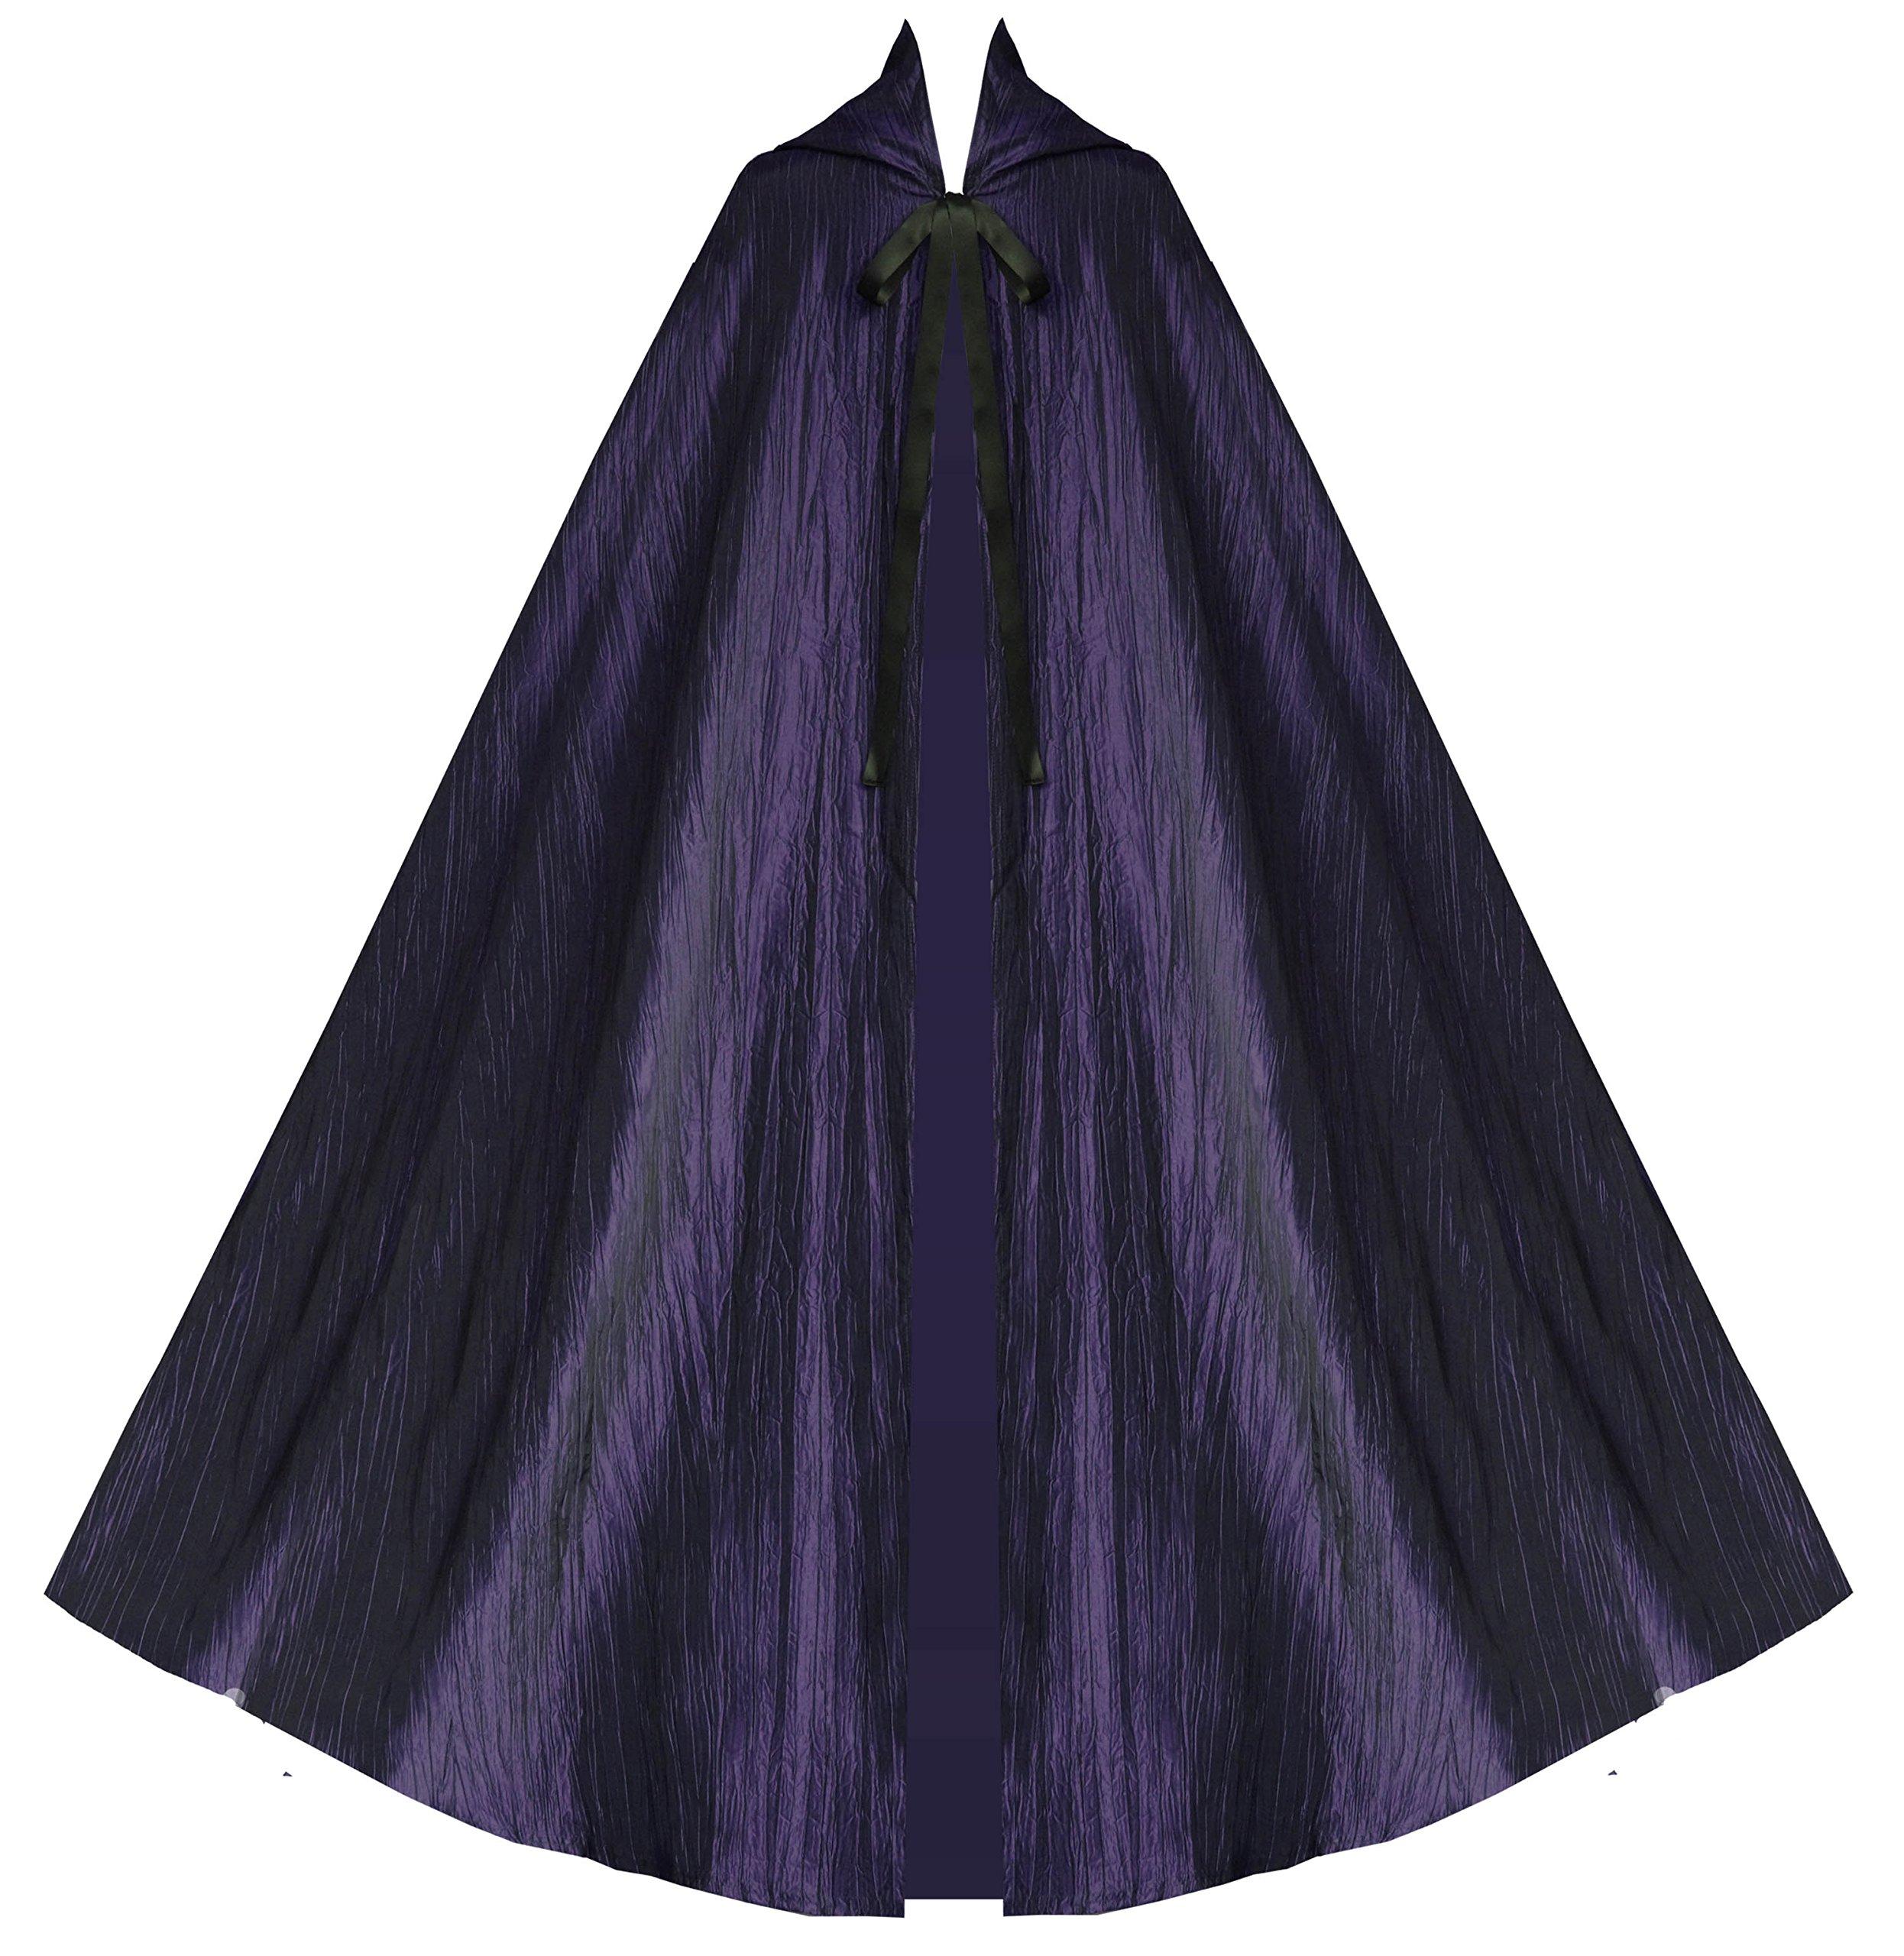 Historical Gothic Steampunk Victorian Hooded Renaissance Short Capelet Cloak Purple